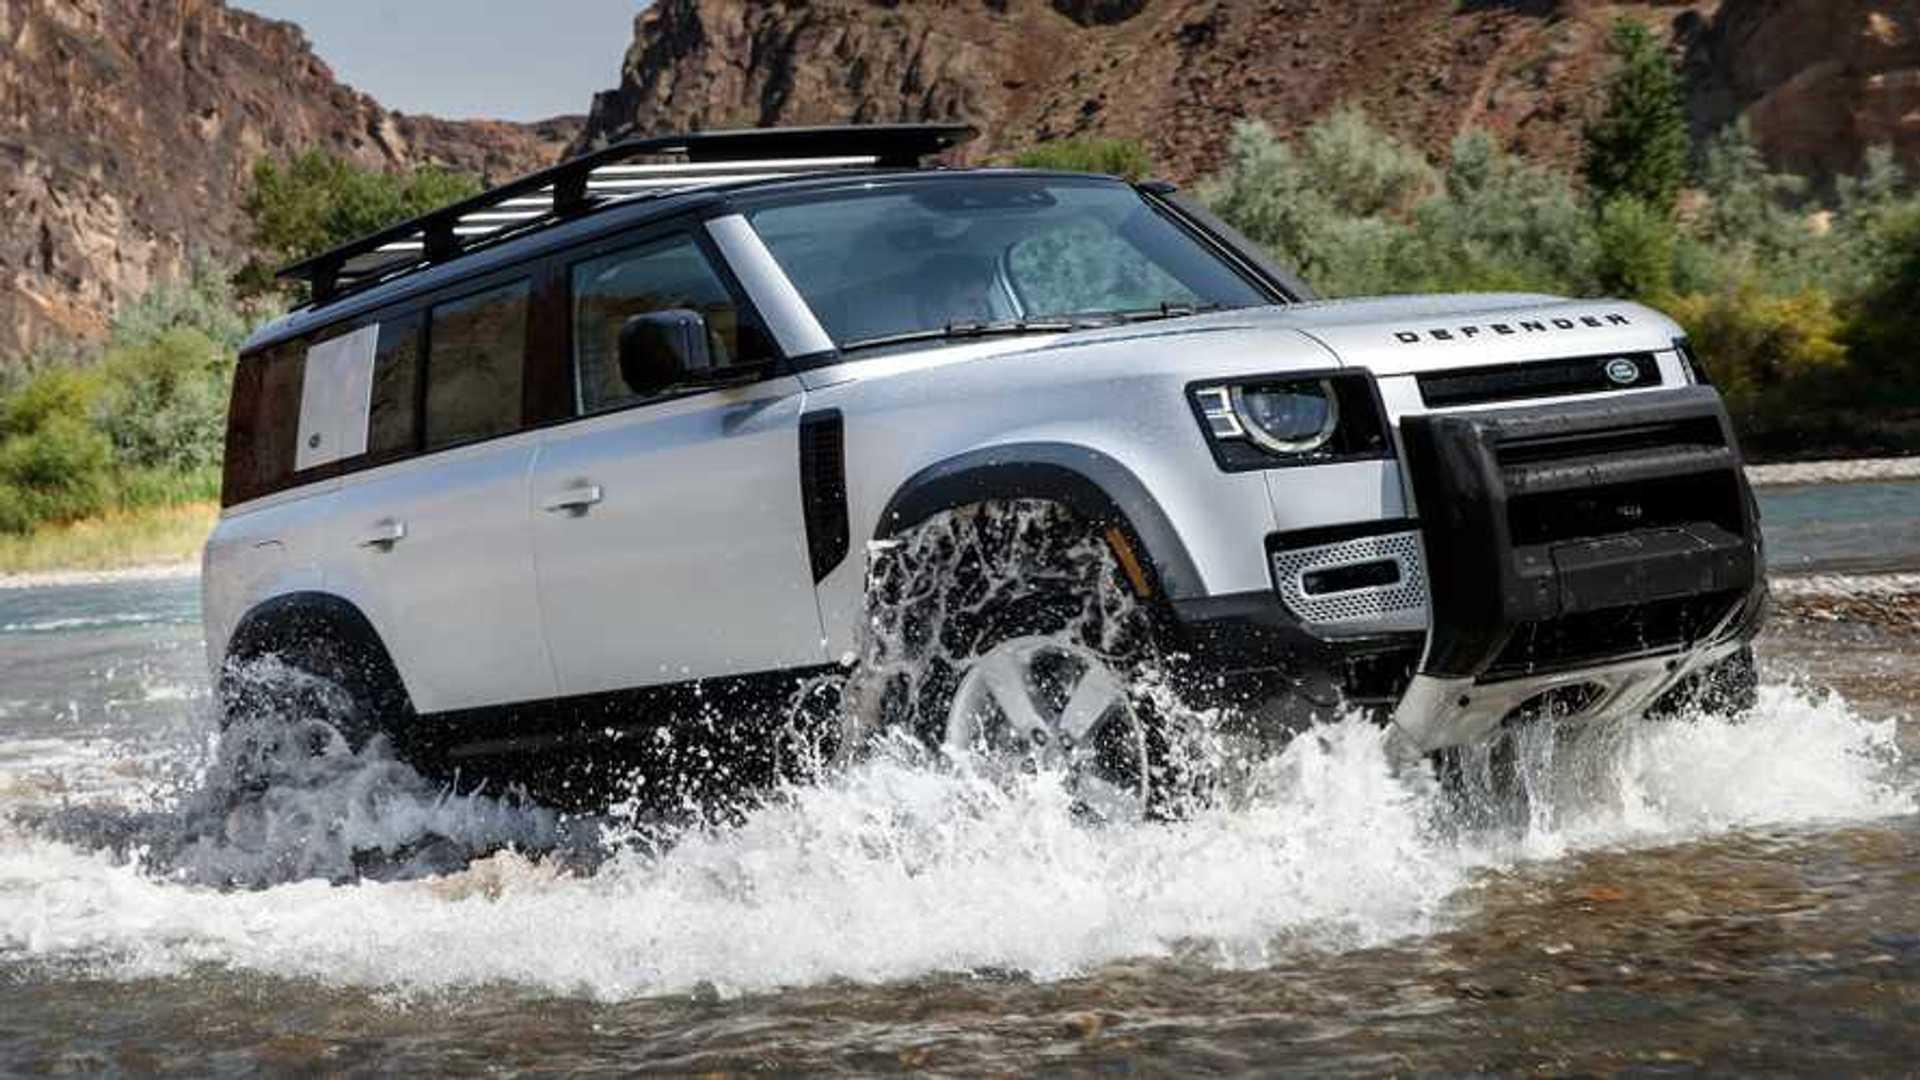 2020 Land Rover Defender Deliveries Finally Begin In United States